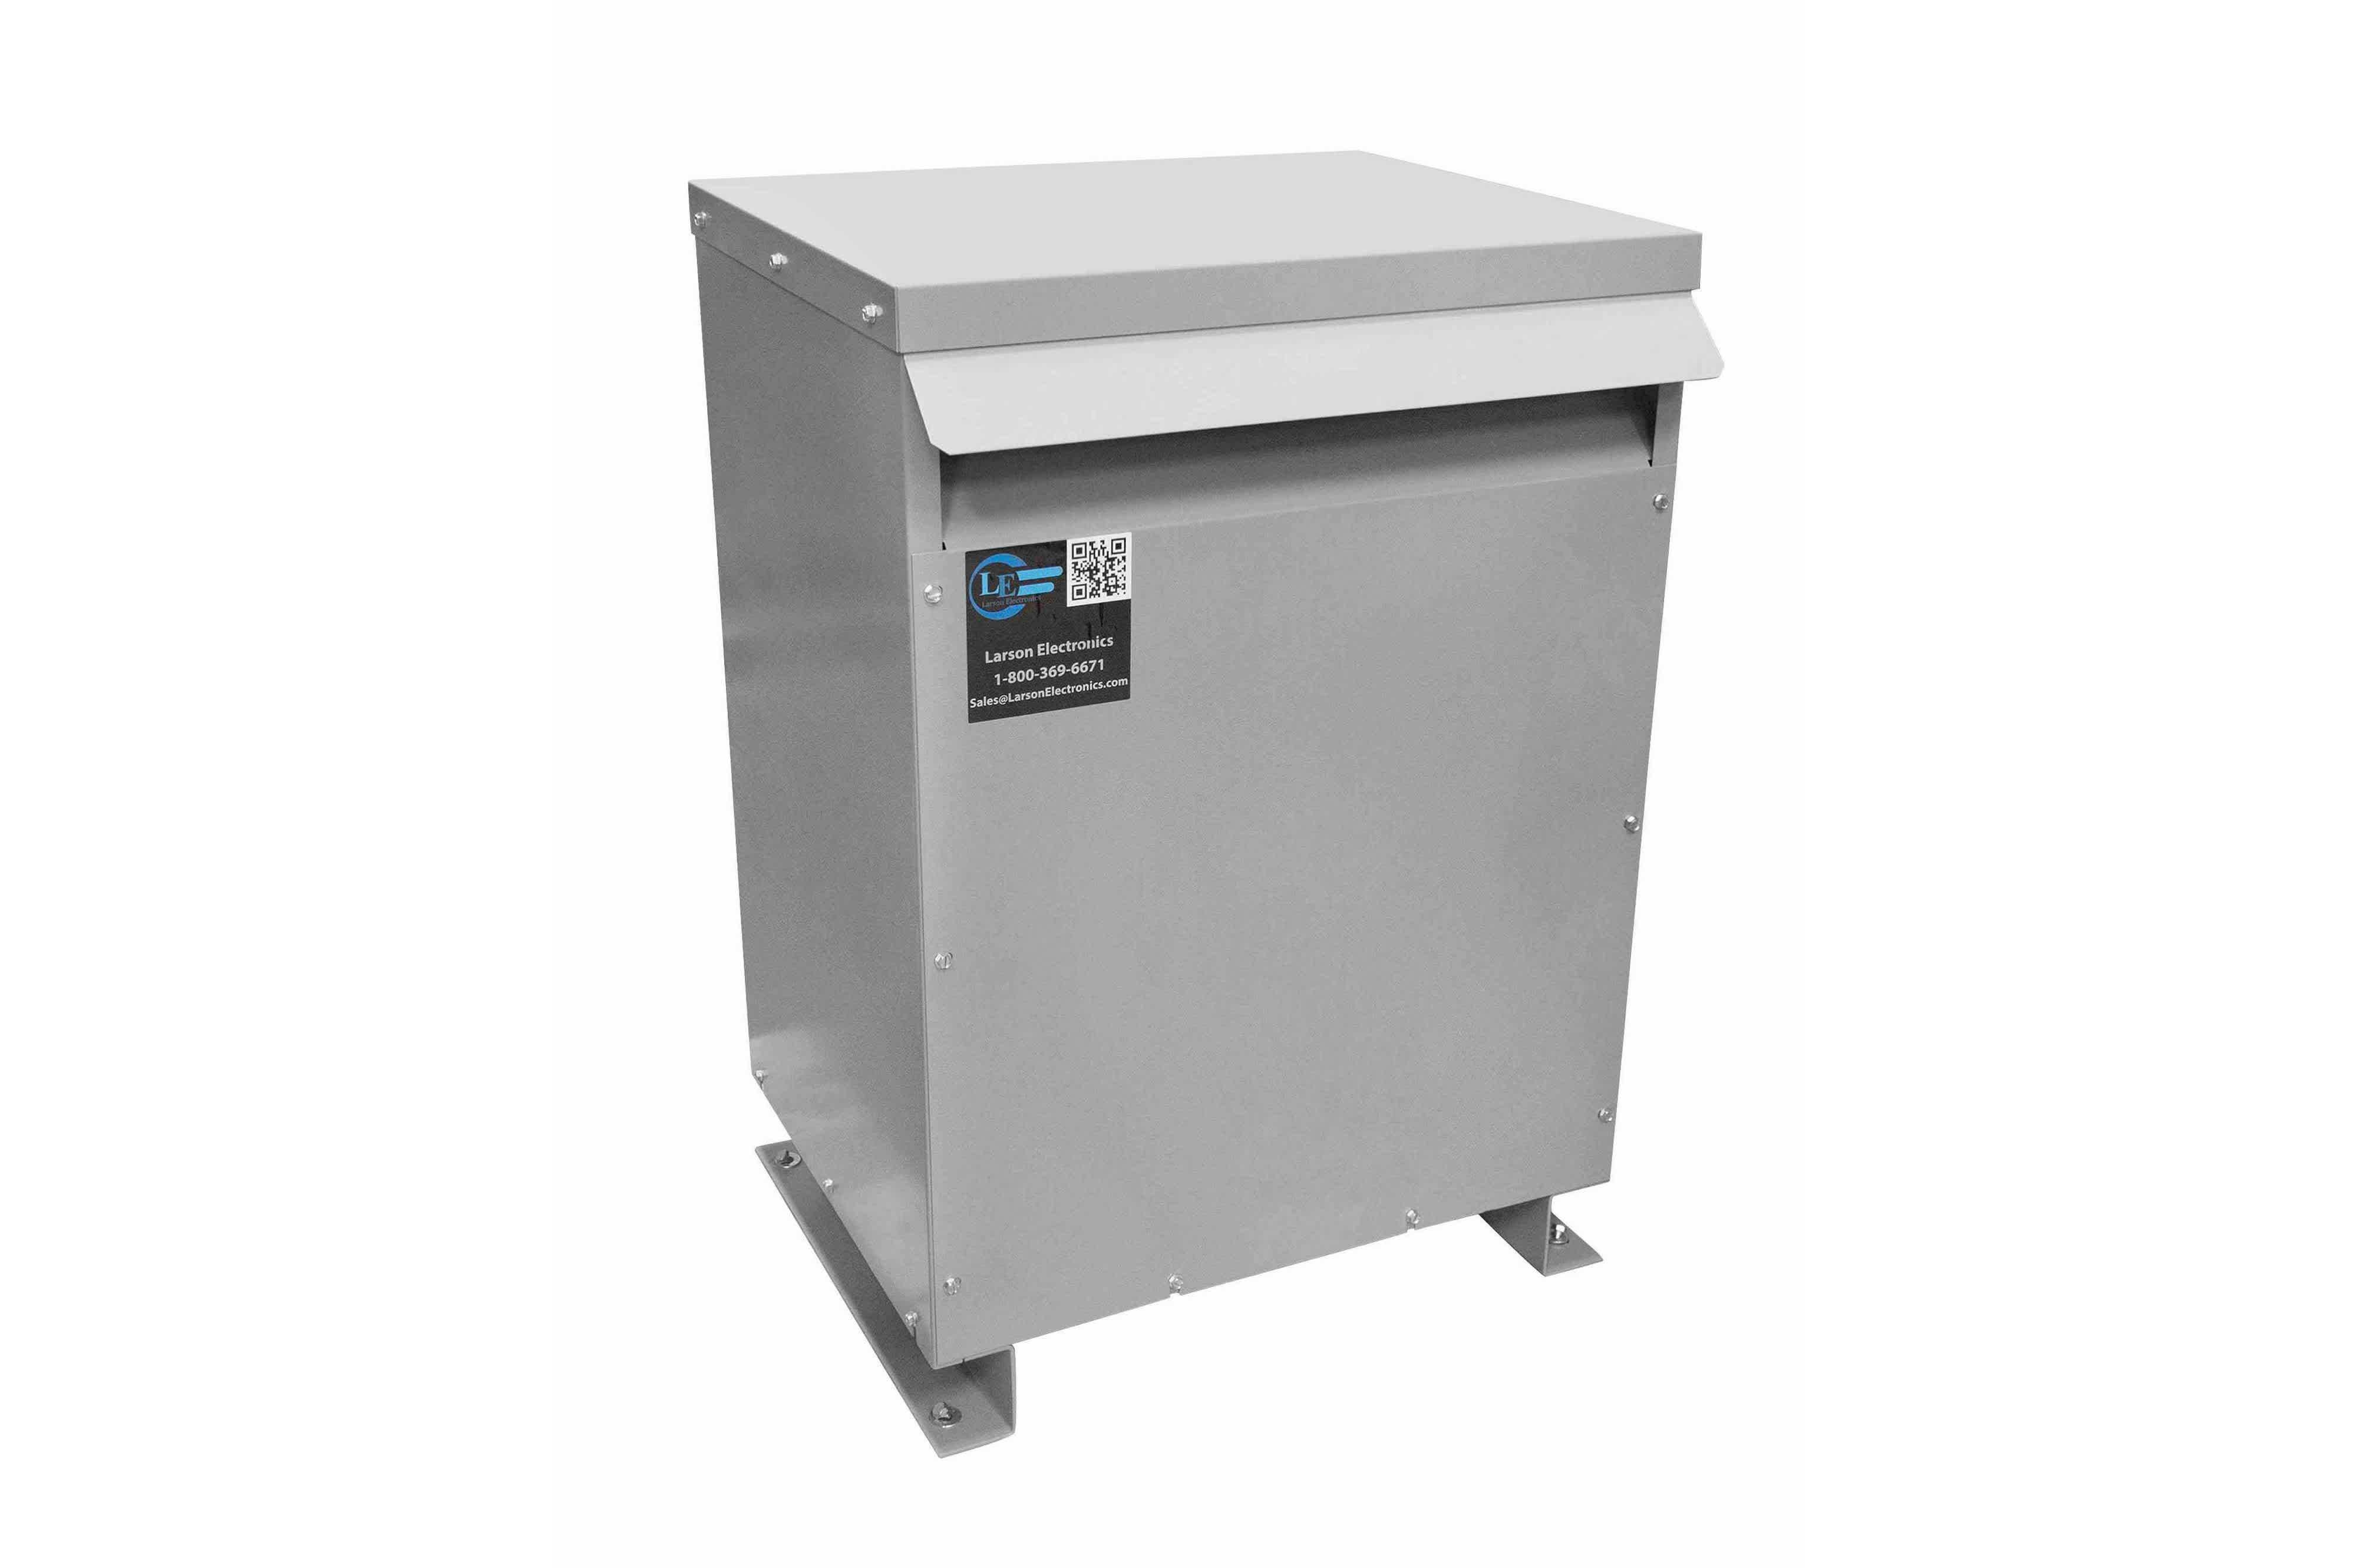 47.5 kVA 3PH Isolation Transformer, 415V Wye Primary, 240V Delta Secondary, N3R, Ventilated, 60 Hz